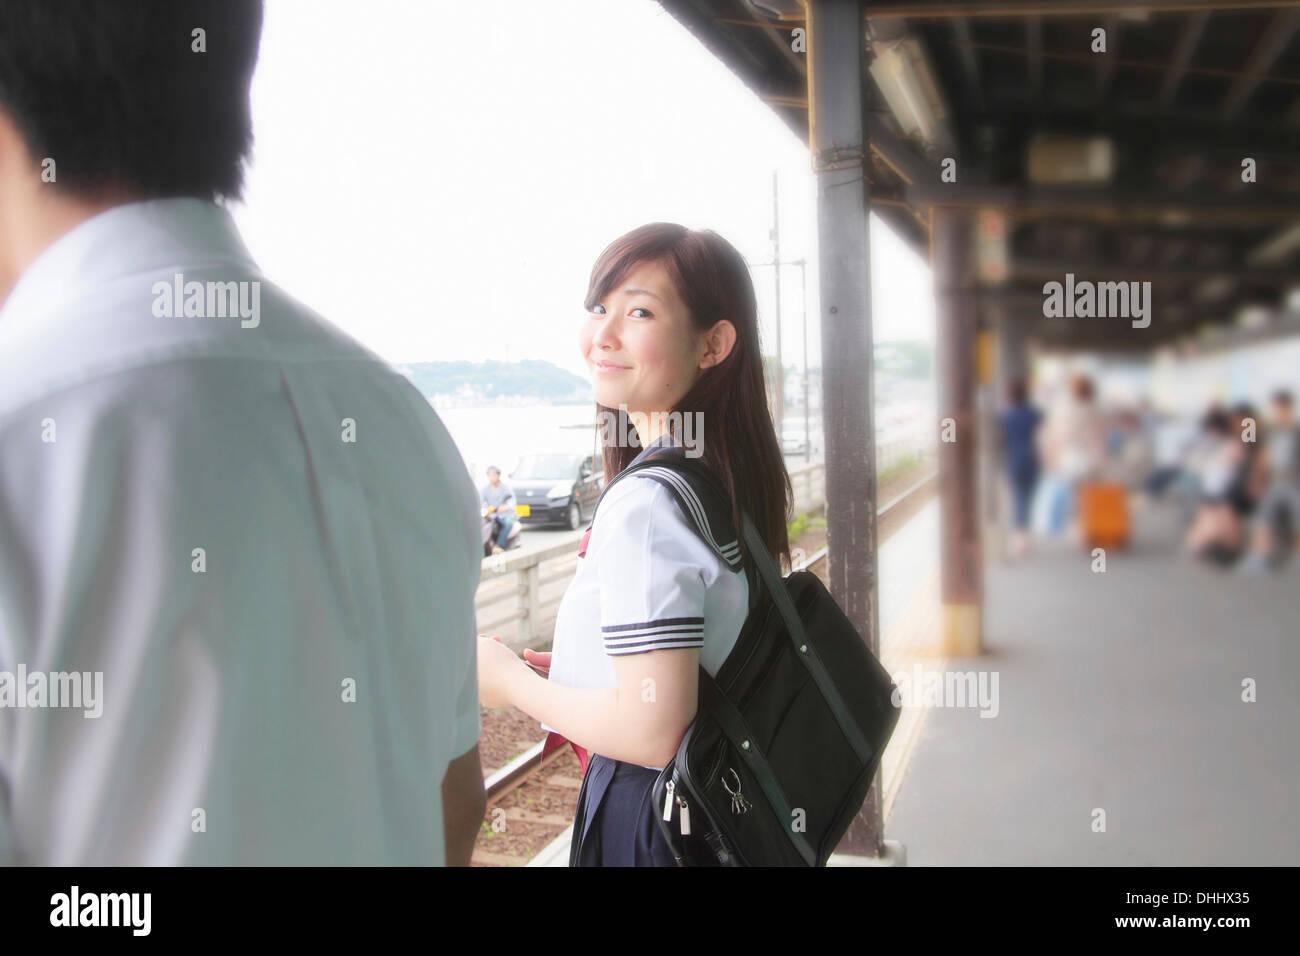 Young woman on railway platform looking at camera - Stock Image